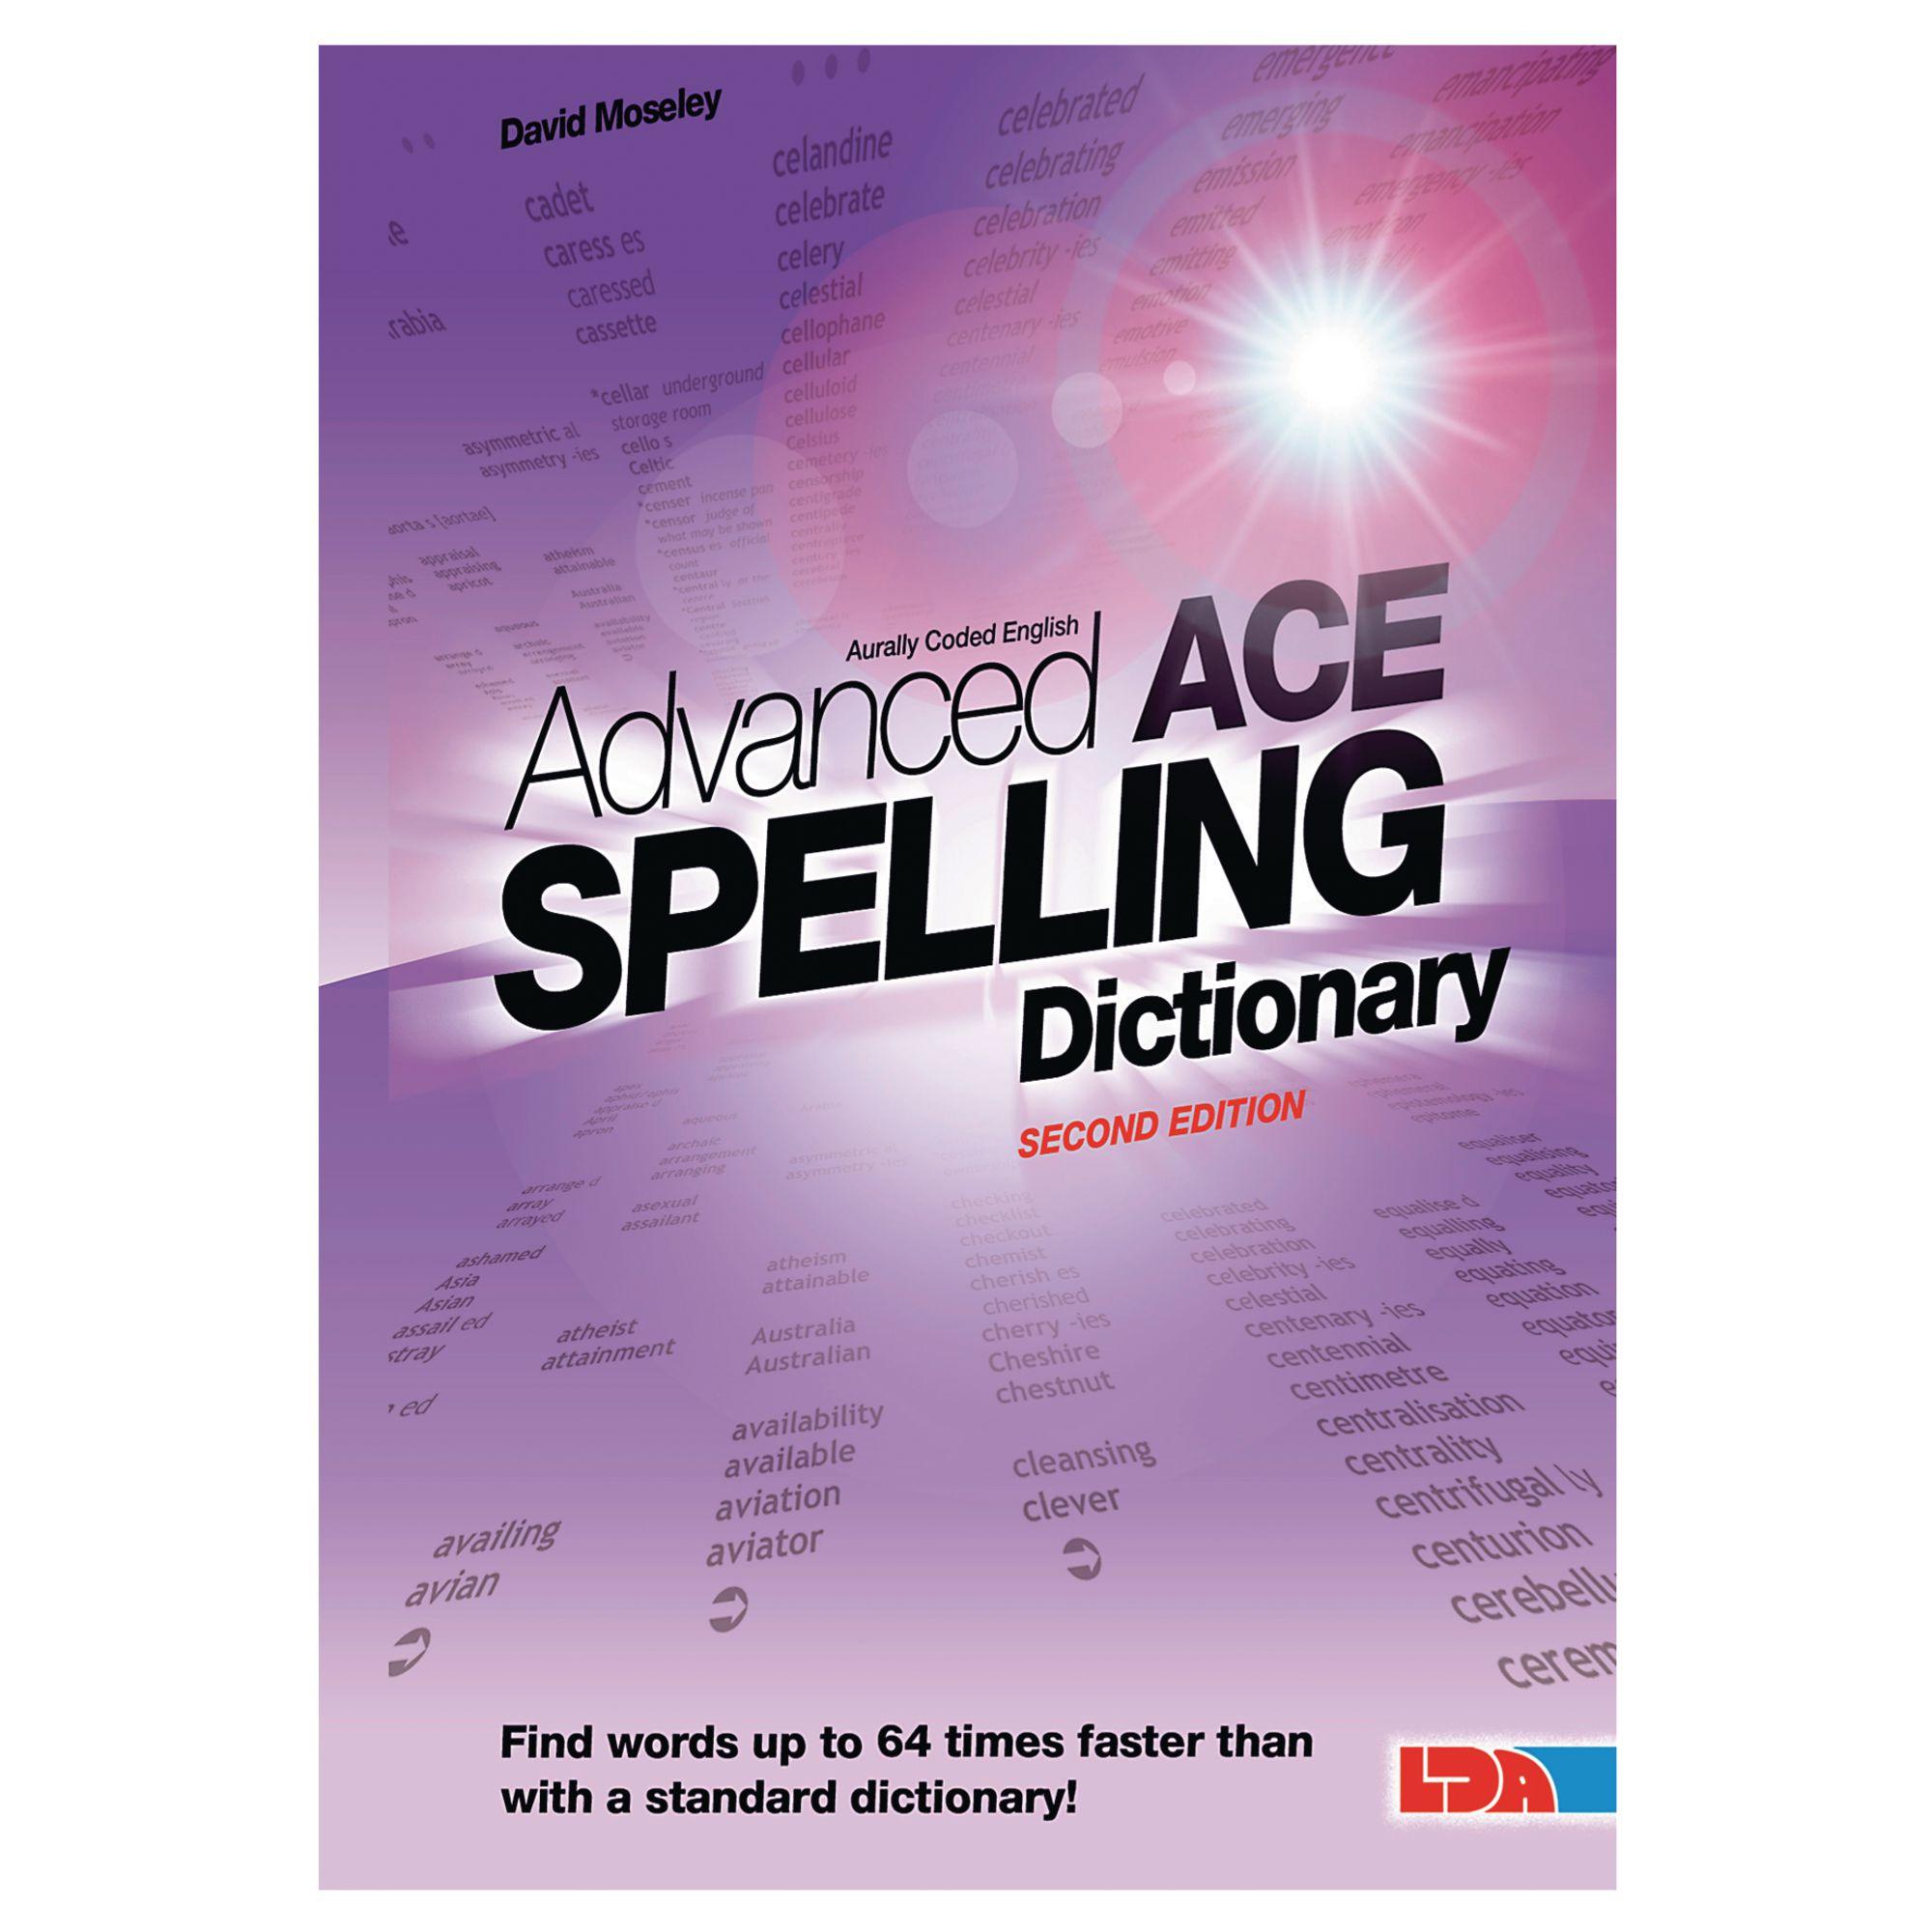 advanced ace spelling pocket dictionary lda resources. Black Bedroom Furniture Sets. Home Design Ideas